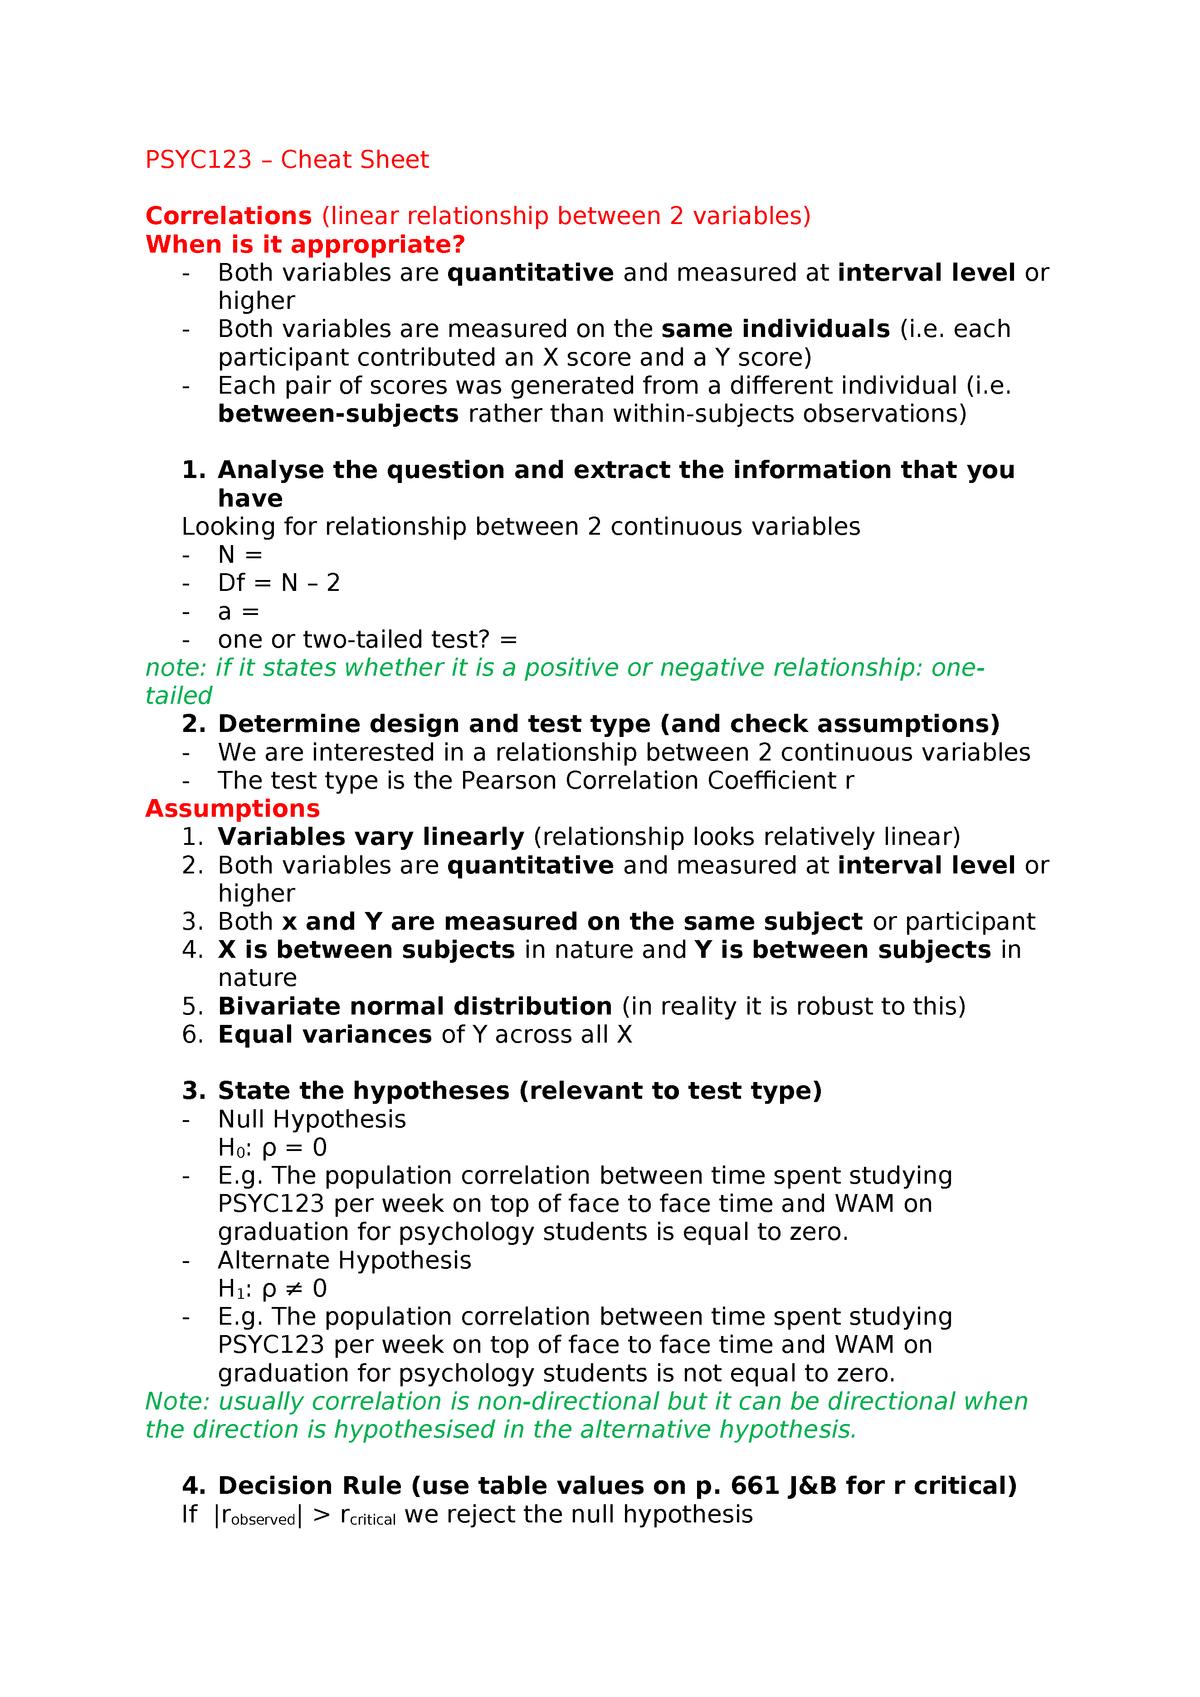 PSYC123 – Cheat Sheet - PSYC123: Theory Design and